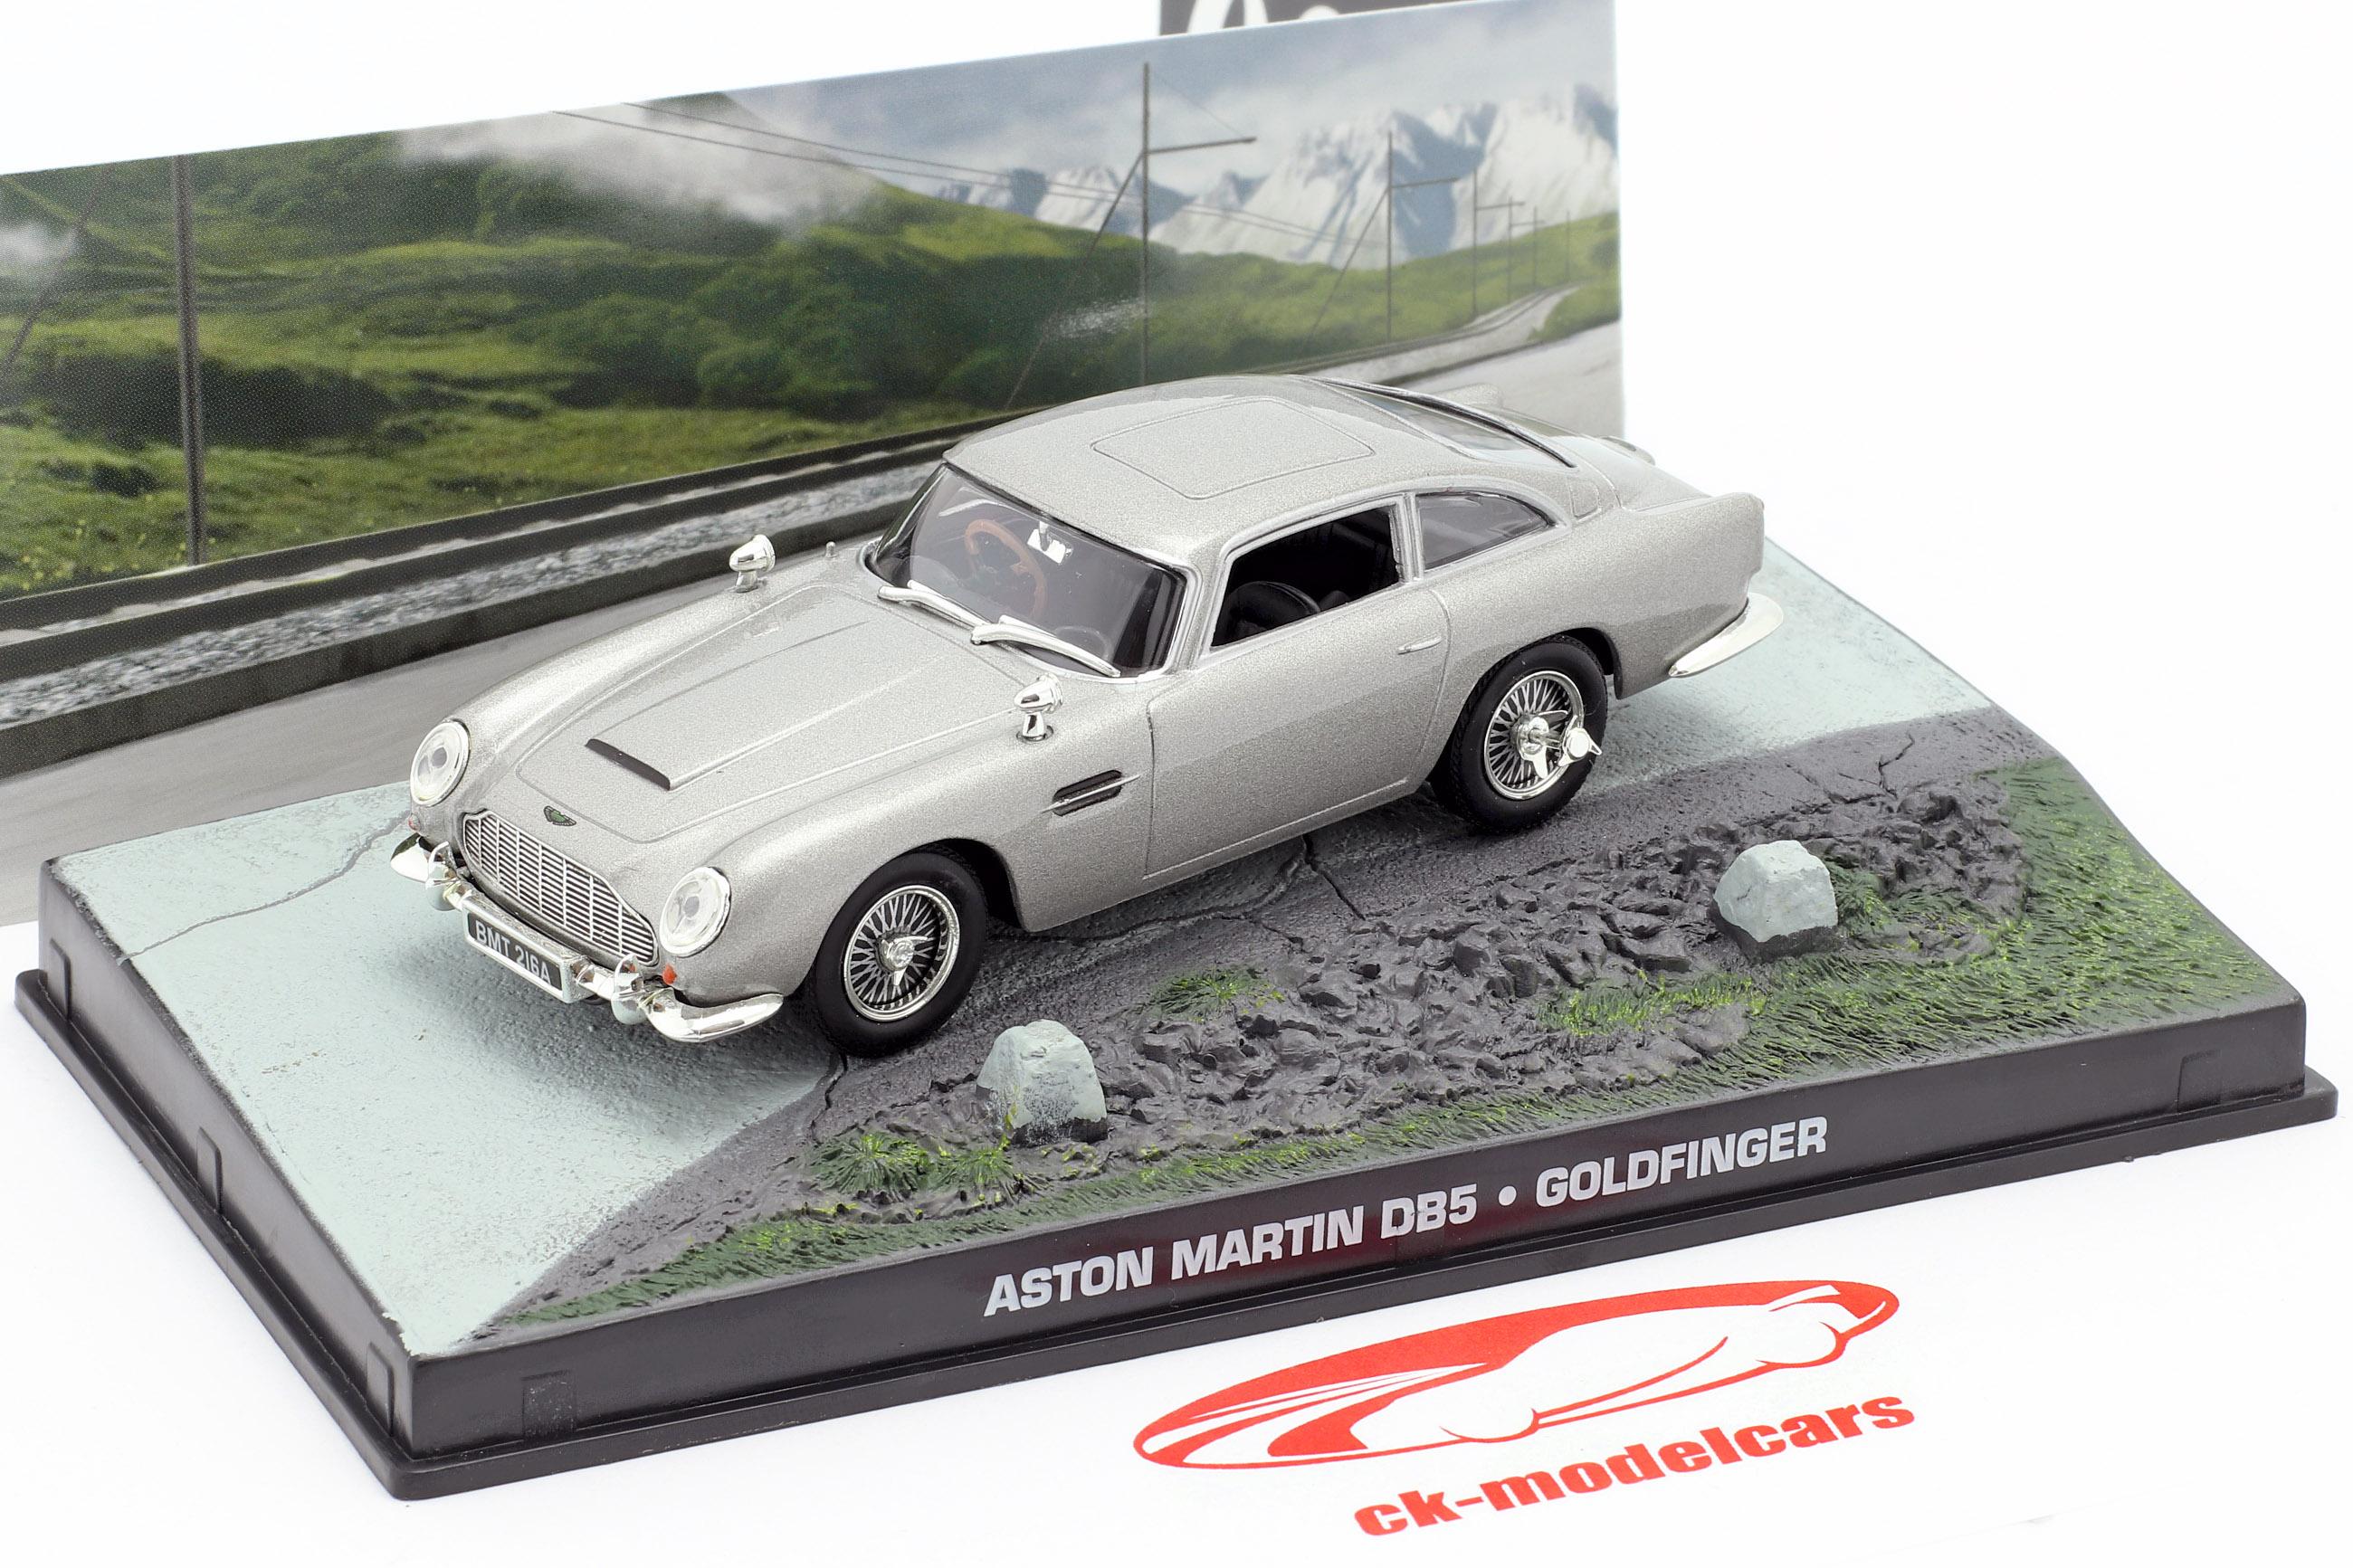 Aston Martin DB5 James Bond filmen Goldfinger Car Silver 1:43 Ixo